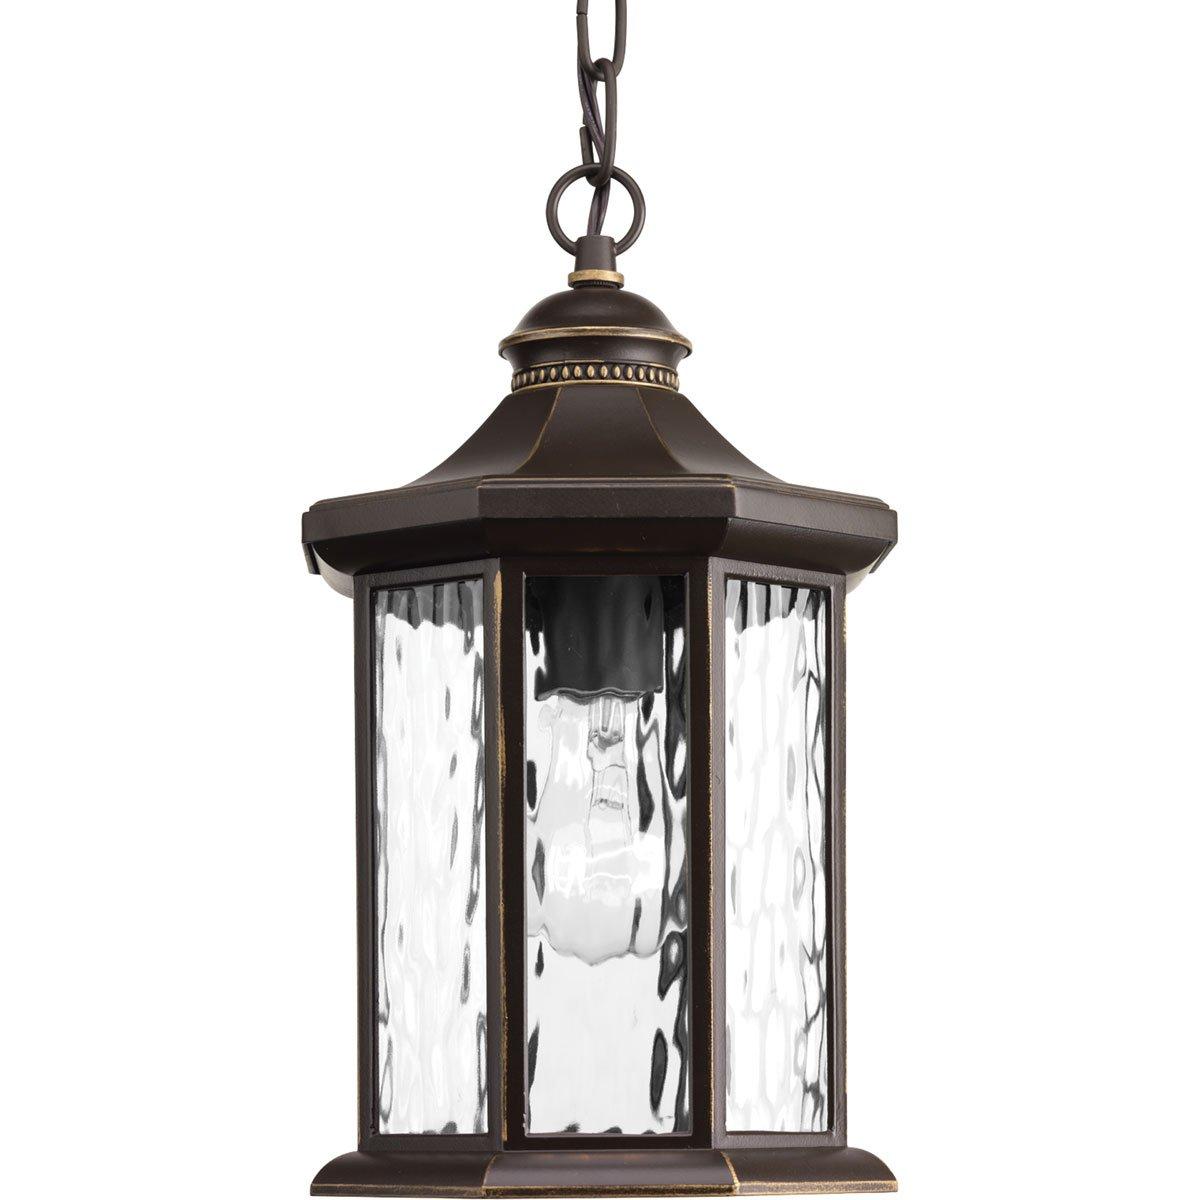 Progress Lighting P6529-20 Traditional/Classic 1-100W Med Hanging Lantern, Antique Bronze